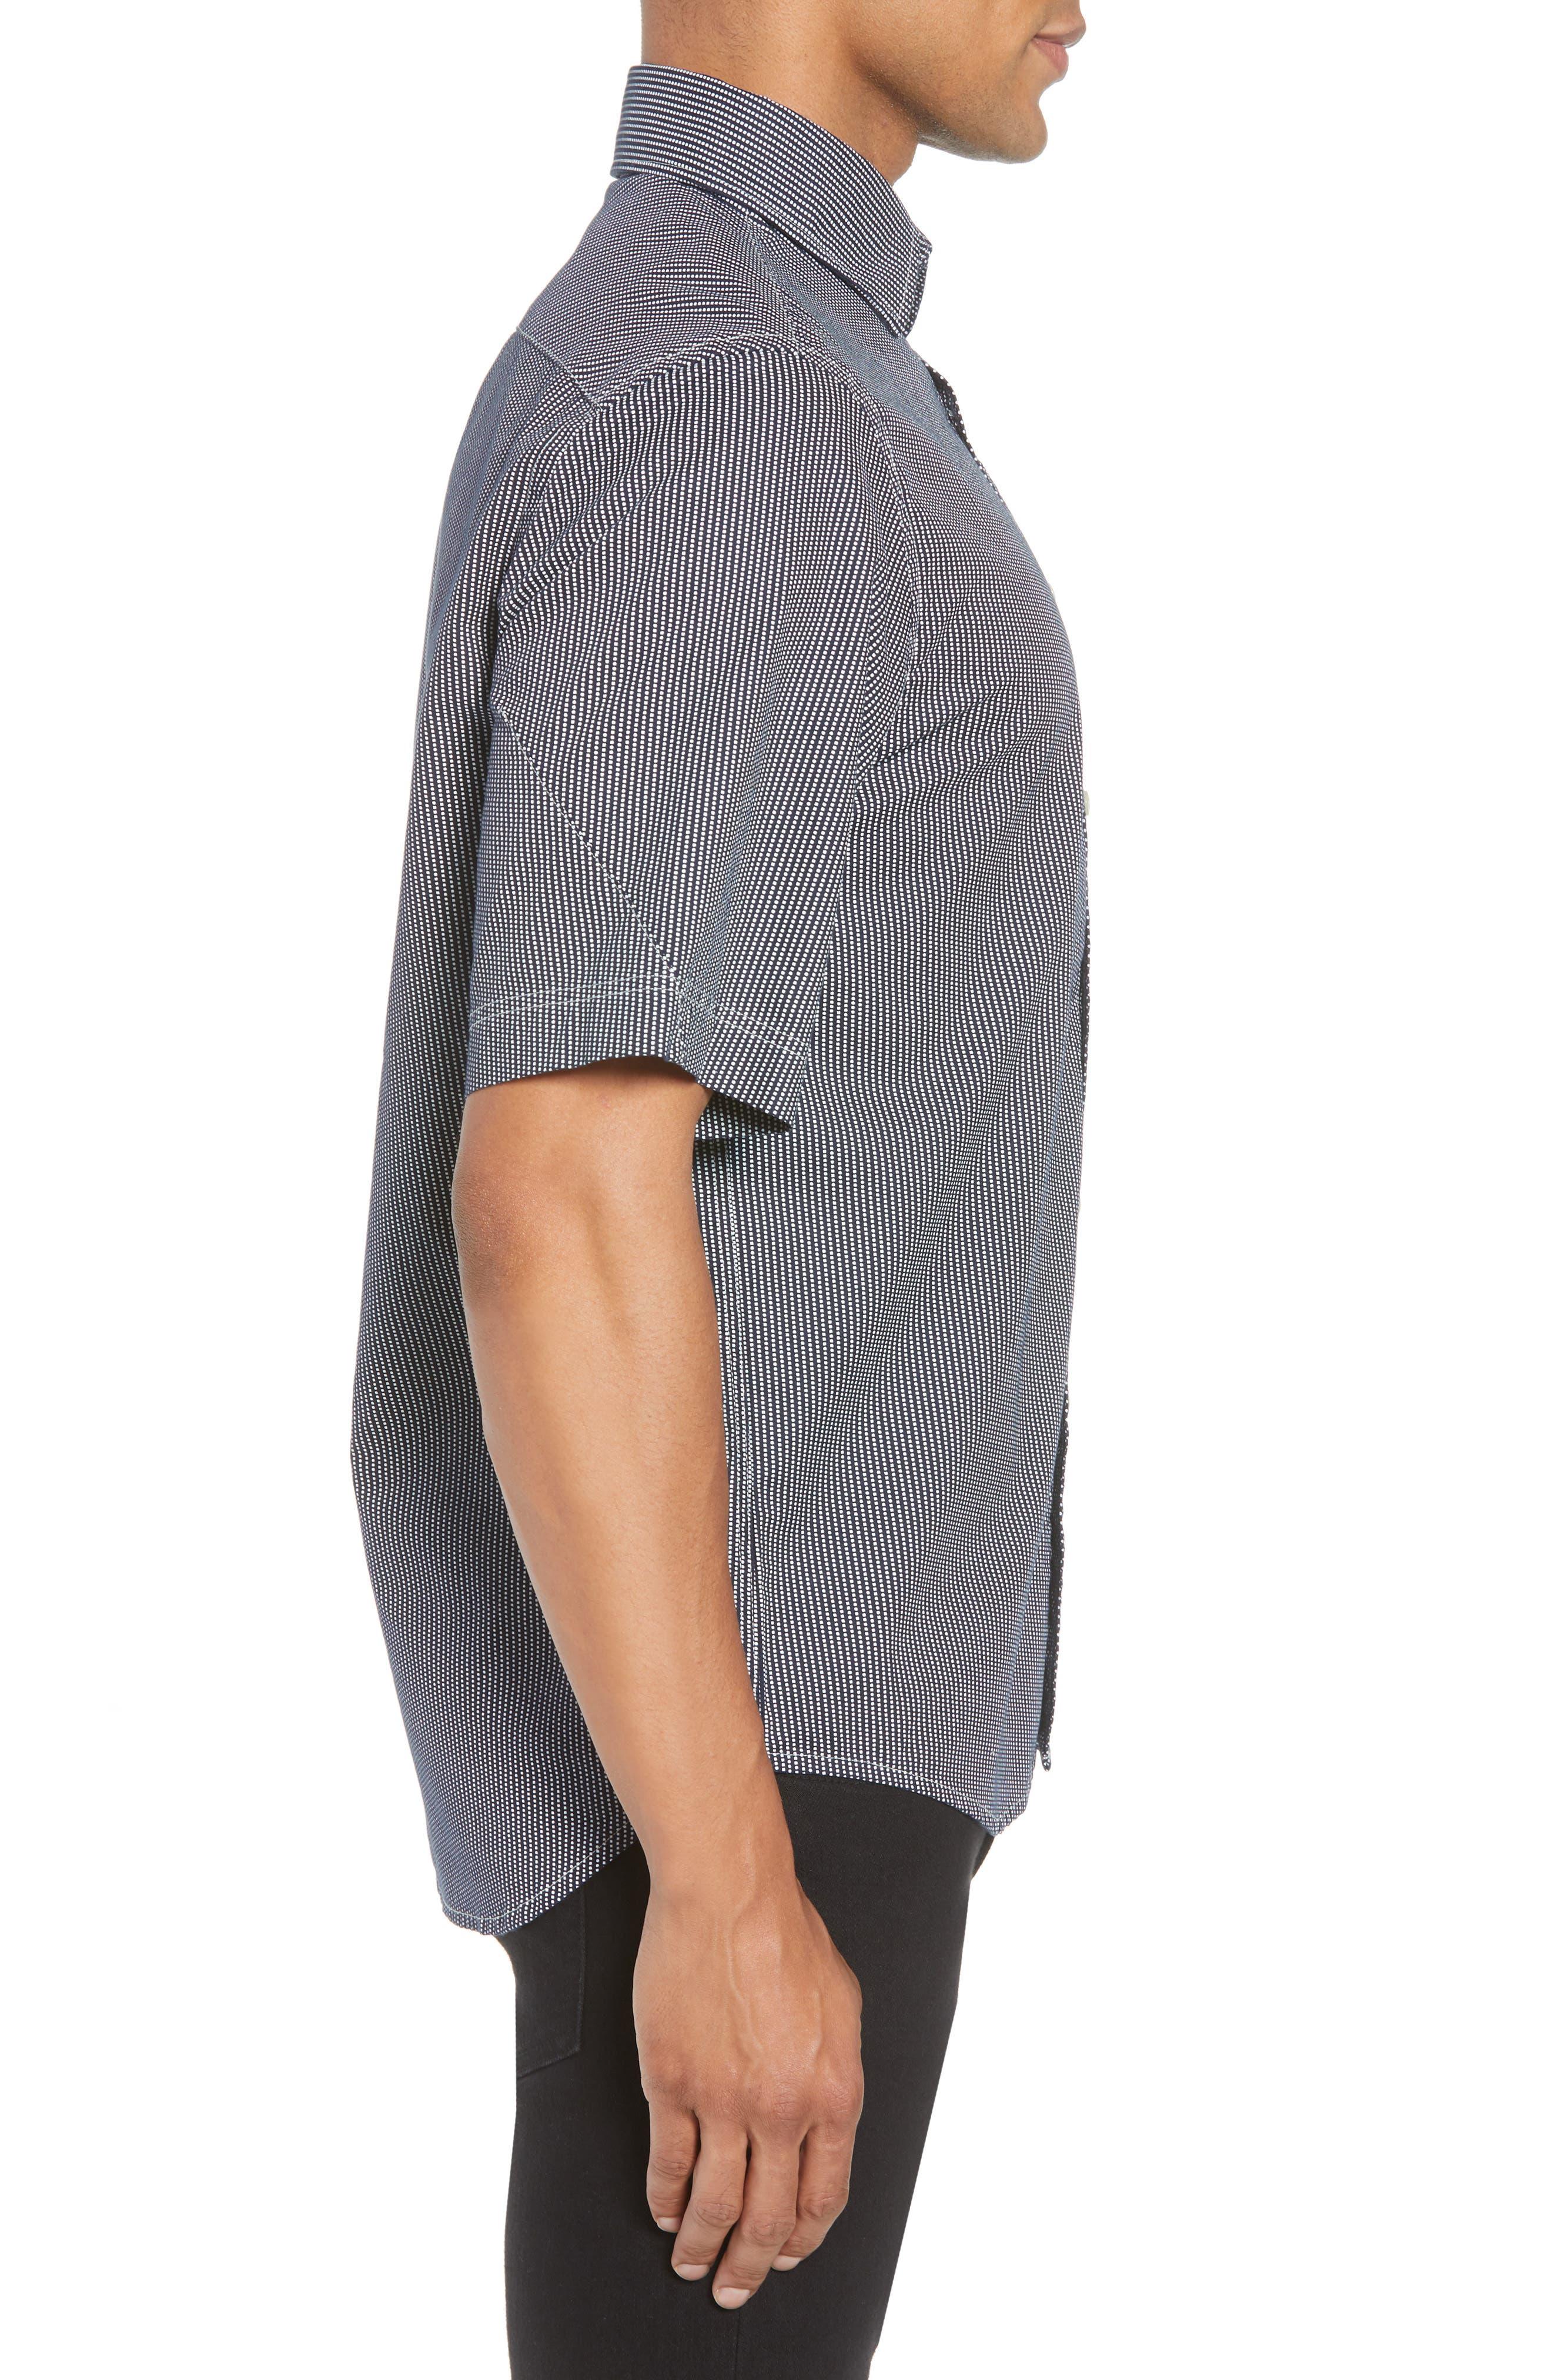 Bristum Straight Ref Shirt,                             Alternate thumbnail 3, color,                             400